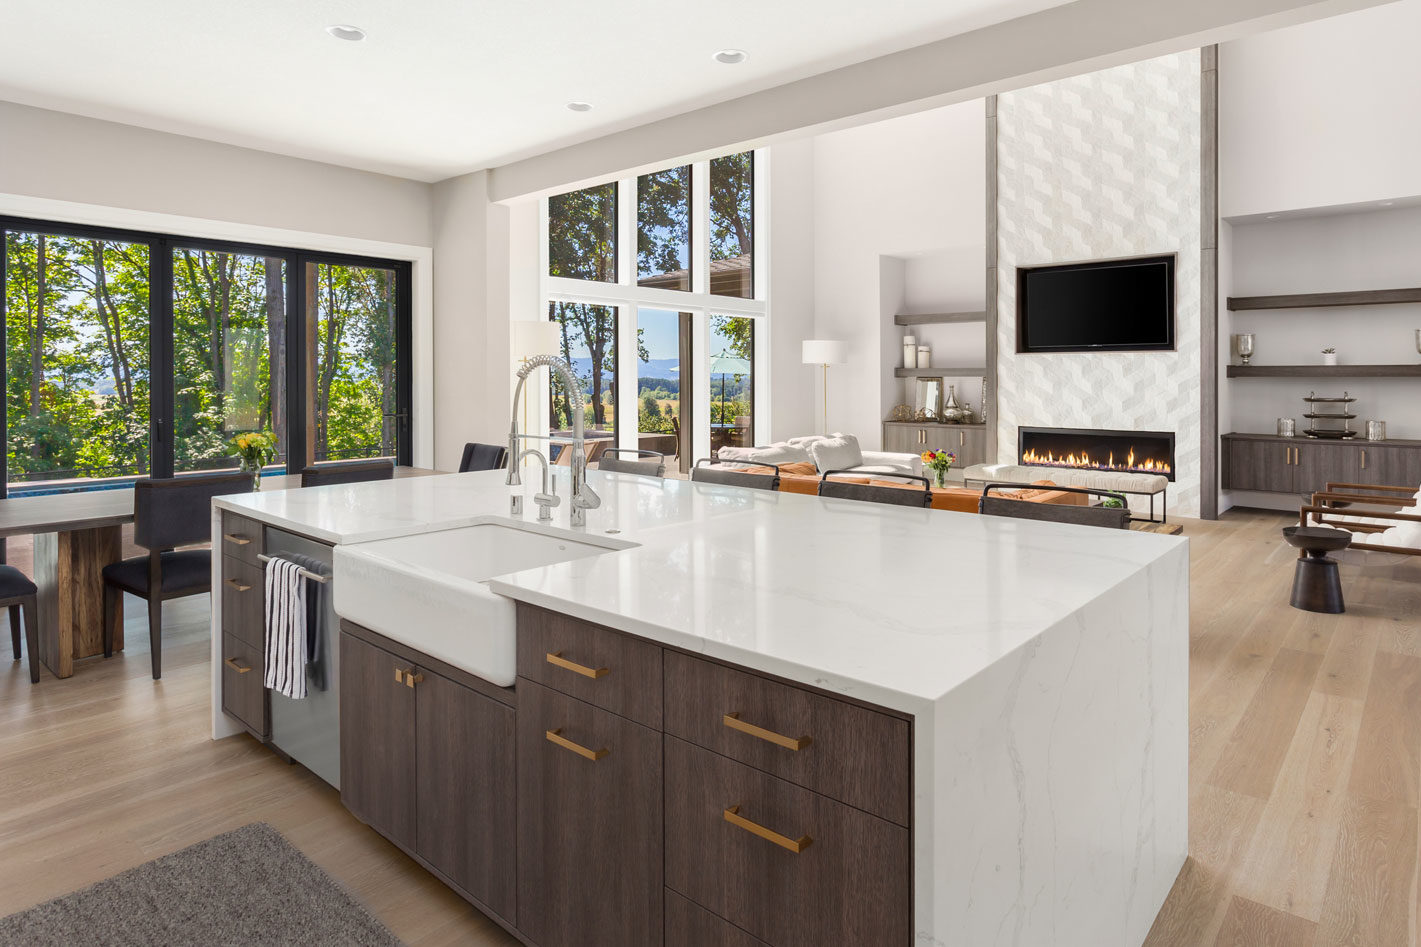 Alpha-Builders-Group-Custom-Homes-and-Condos-Austin-Texas-Jacksonville-Florida-Interior-Kitchen-Island-e1566395329166